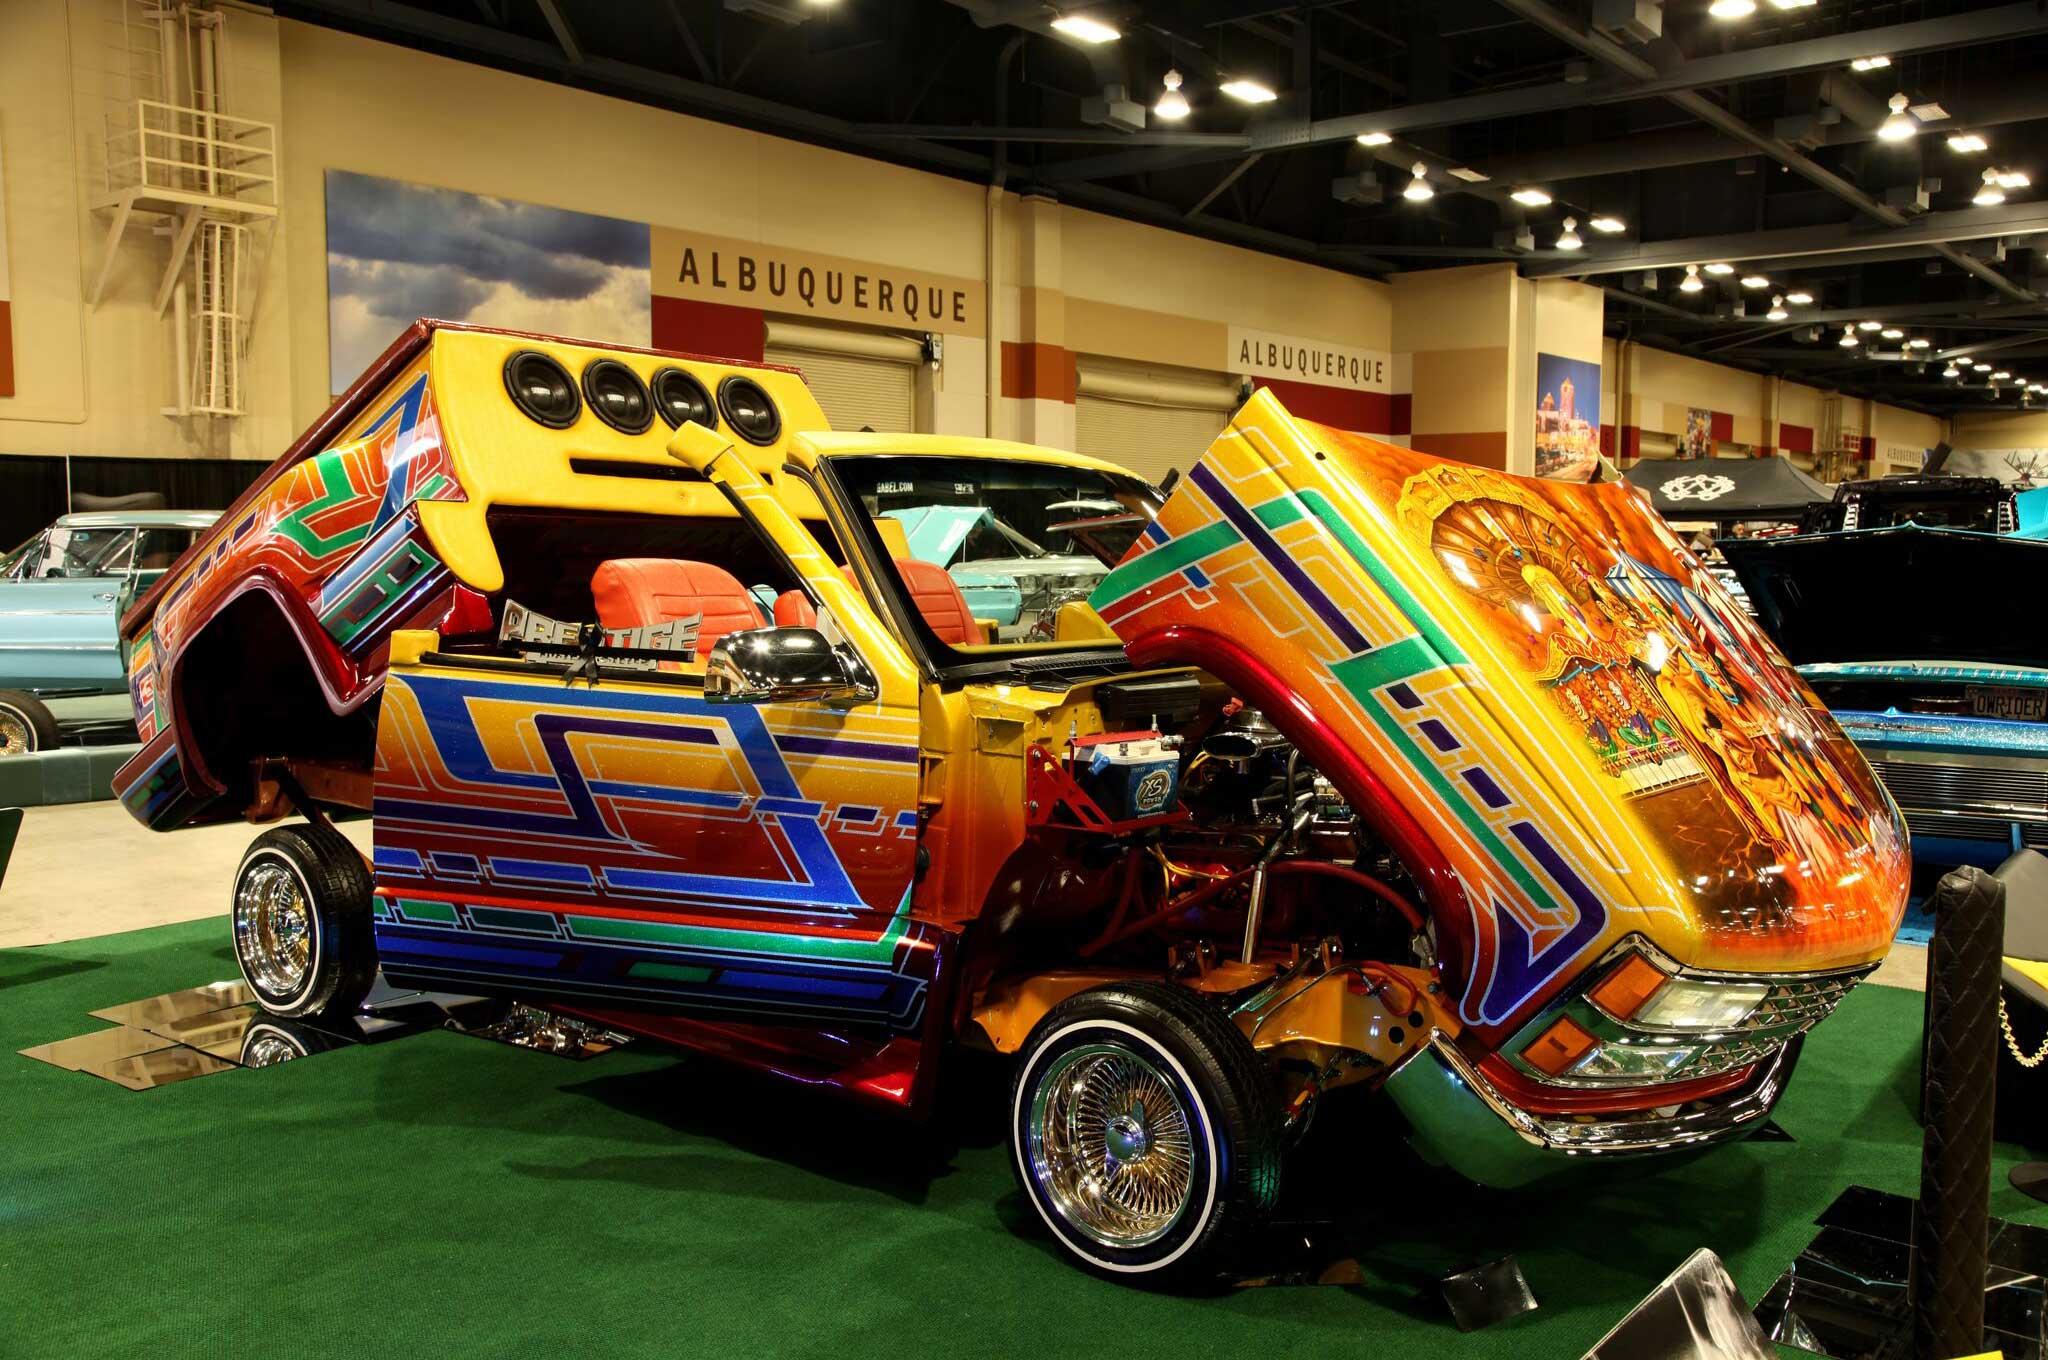 2017 lowrider albuquerque show custom chevy truck lowrider for Craft shows in albuquerque 2017